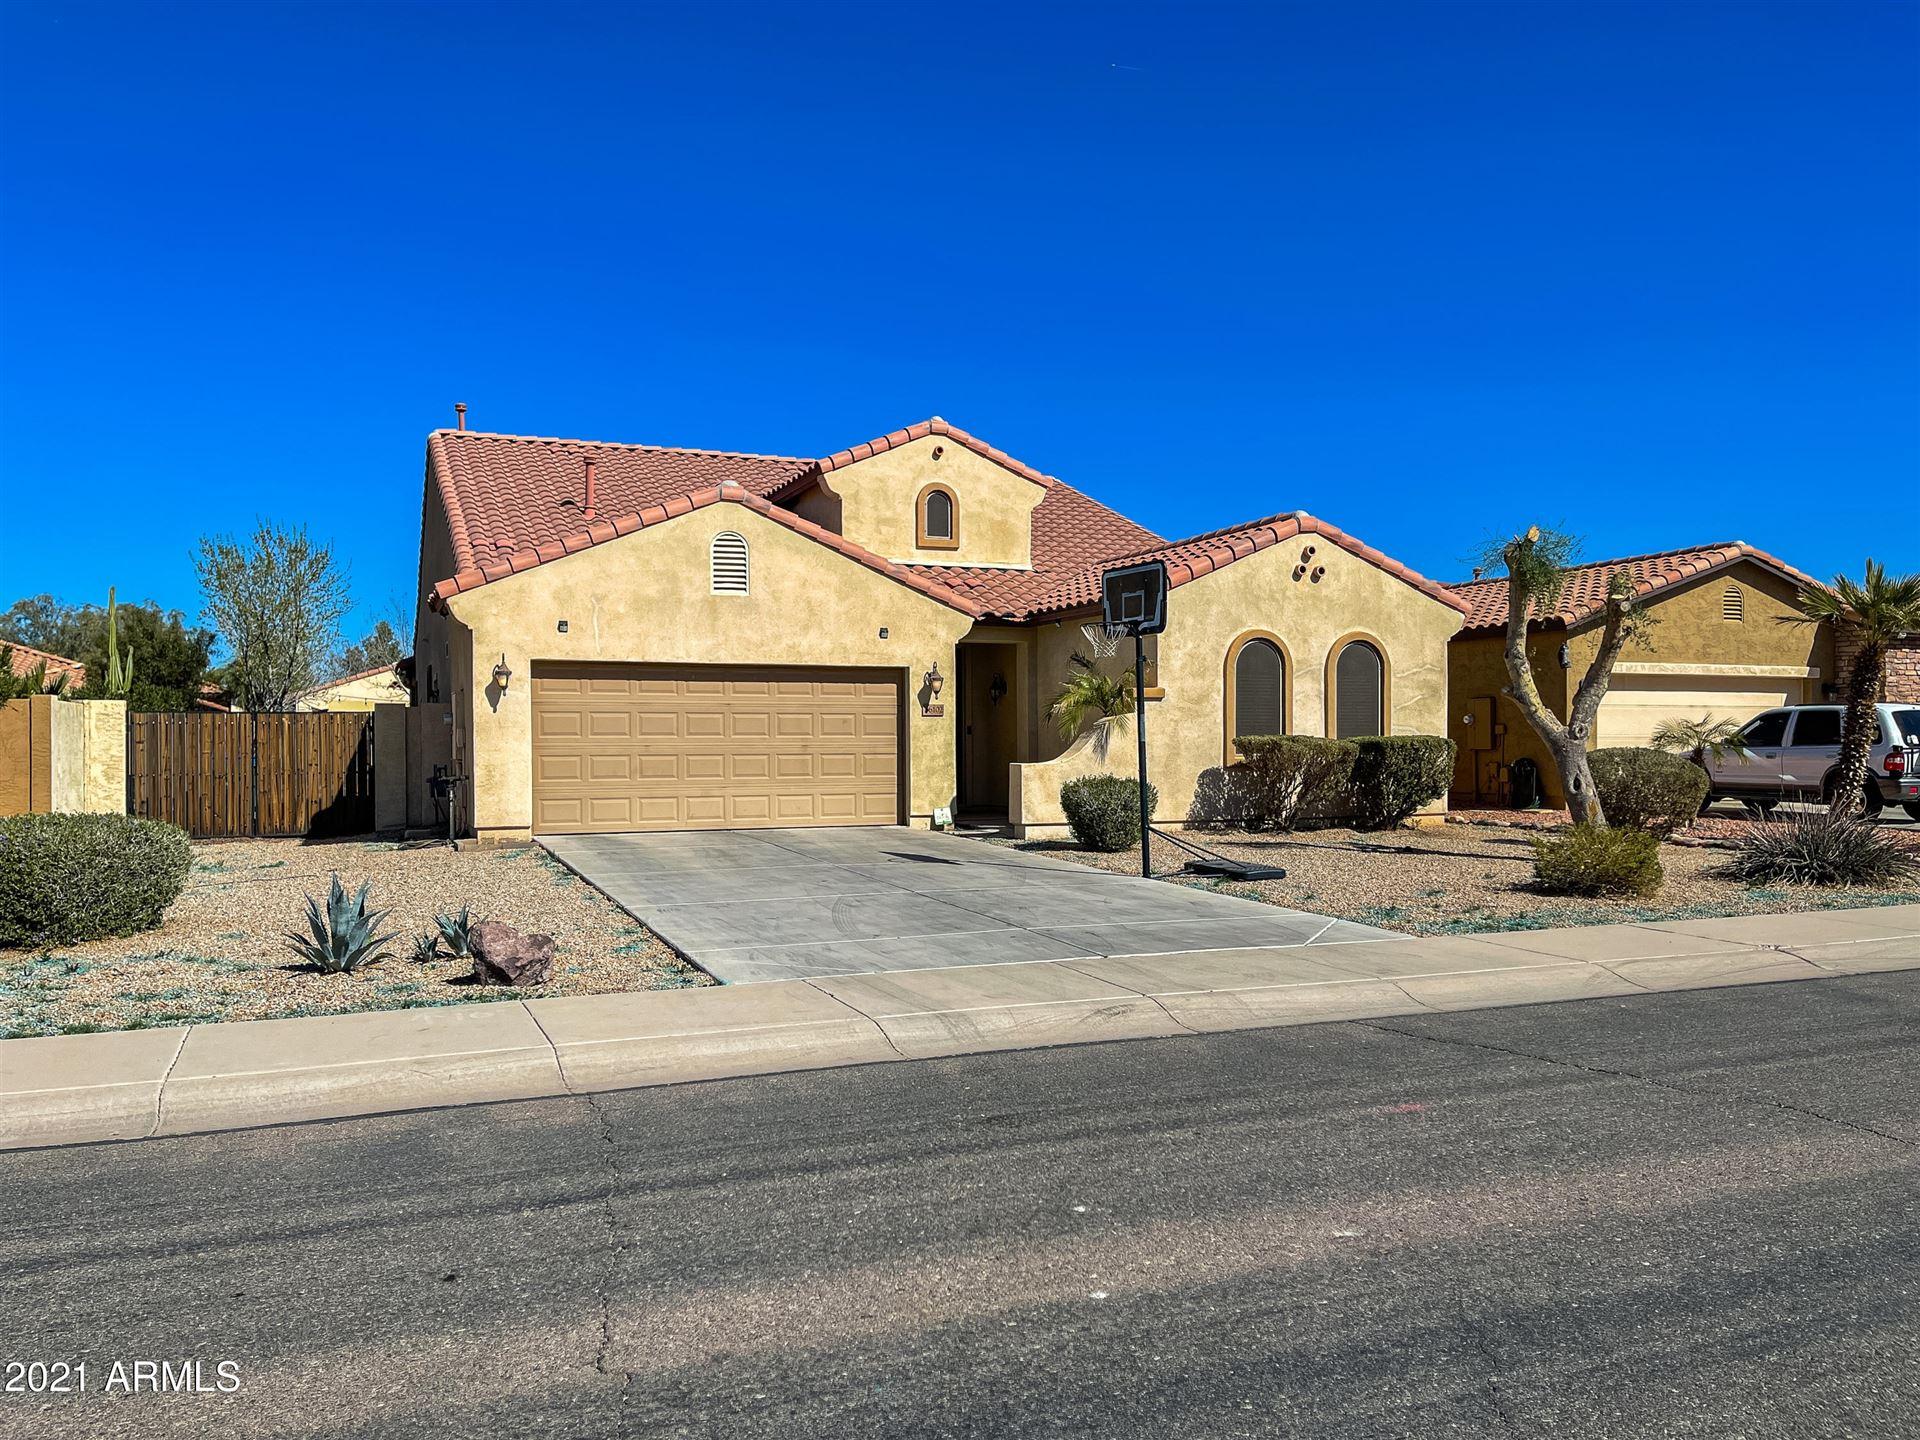 Photo of 36102 W CATALAN Street, Maricopa, AZ 85138 (MLS # 6199671)